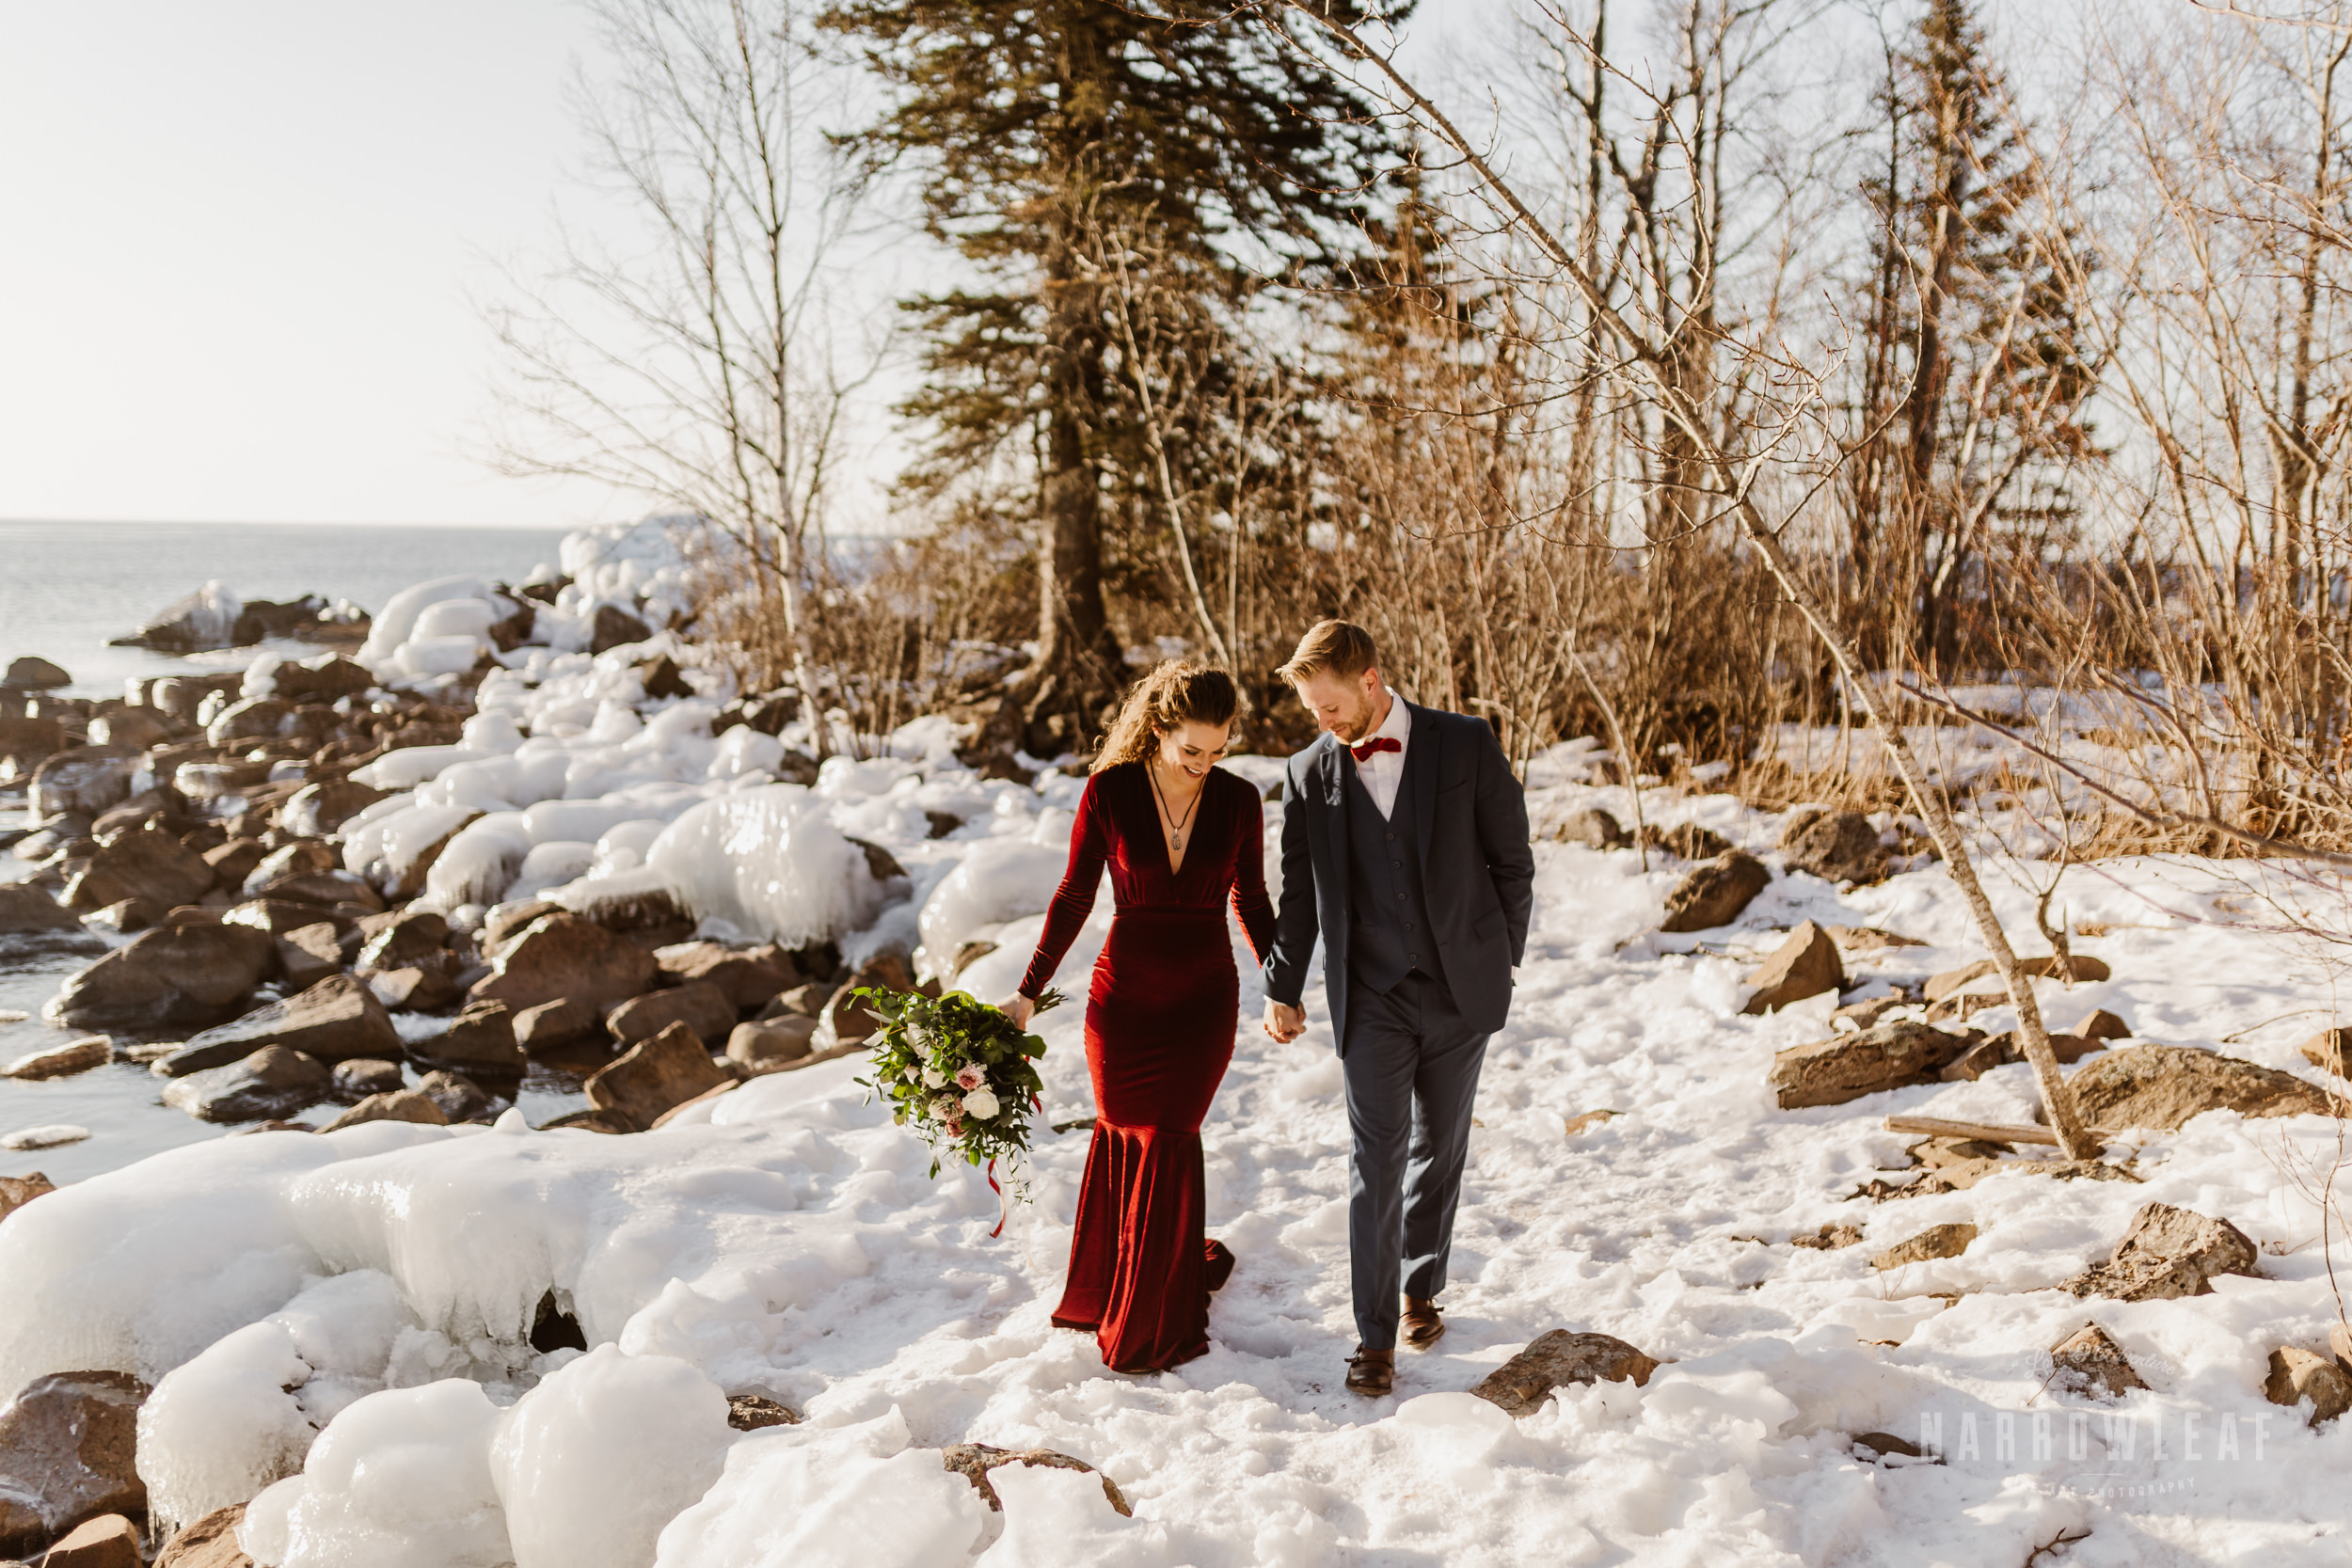 winter-adventure-elopement-tettegouche-state-park-minnesota-Narrowleaf_Love_and_Adventure_Photography-8691.jpg